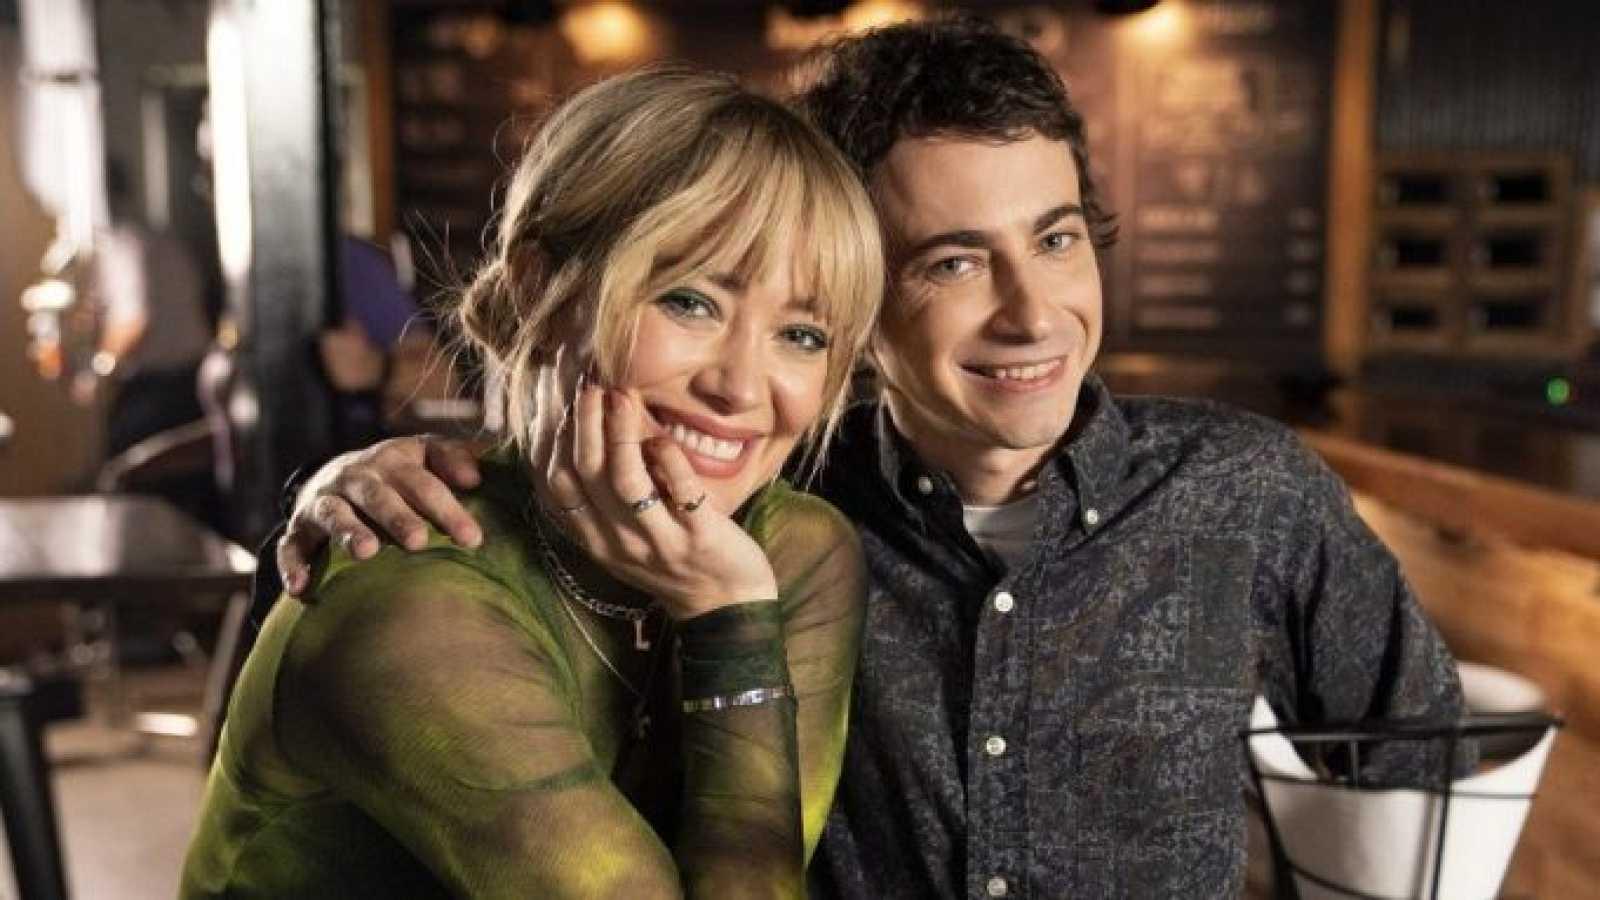 Hilary Duff and Adam Lamberg de 'Lizzie McGuire'